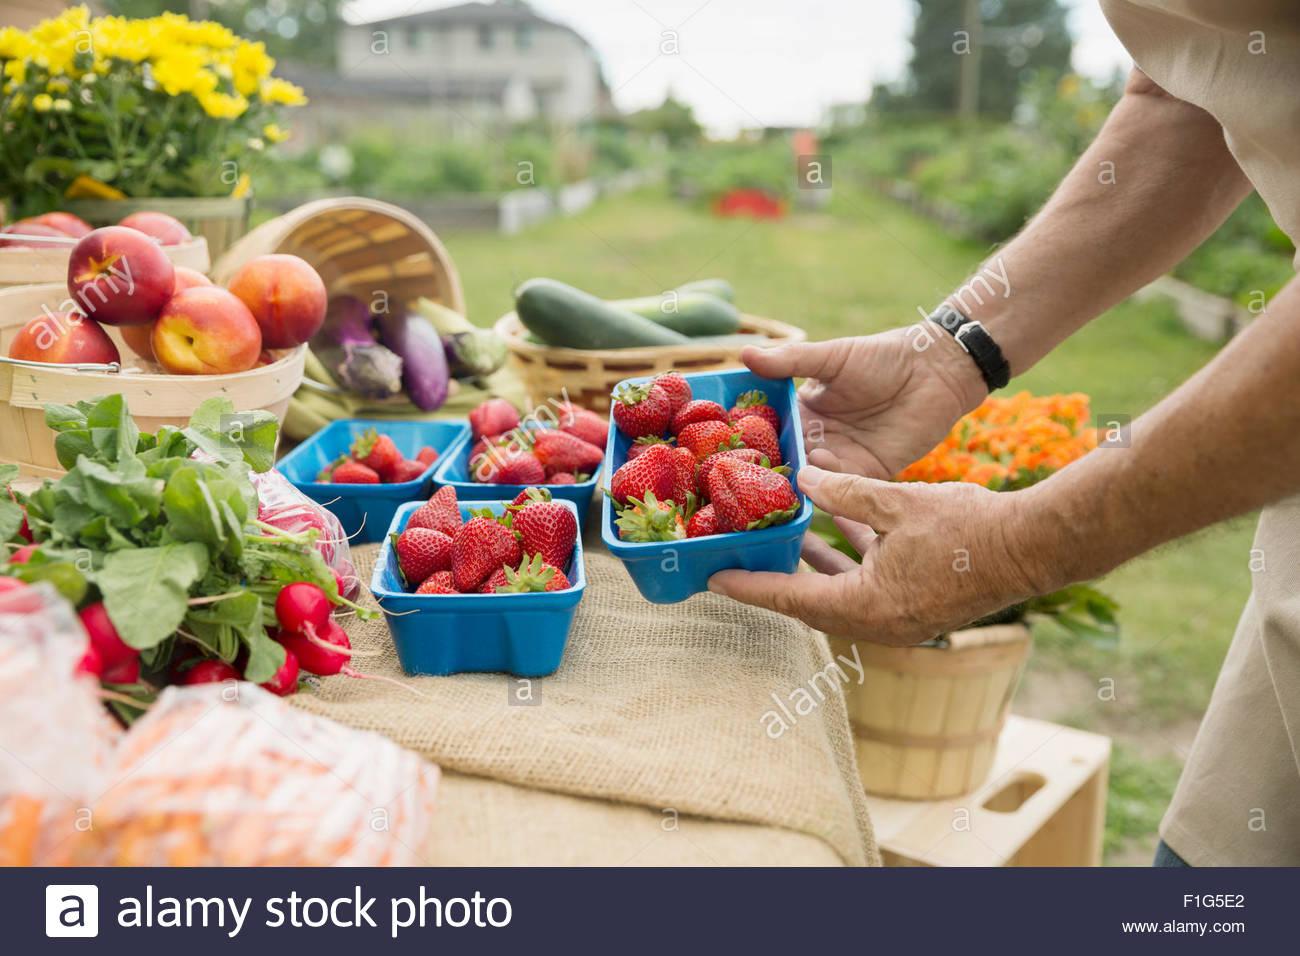 Farmer checking fresh strawberries at farmers market stall - Stock Image